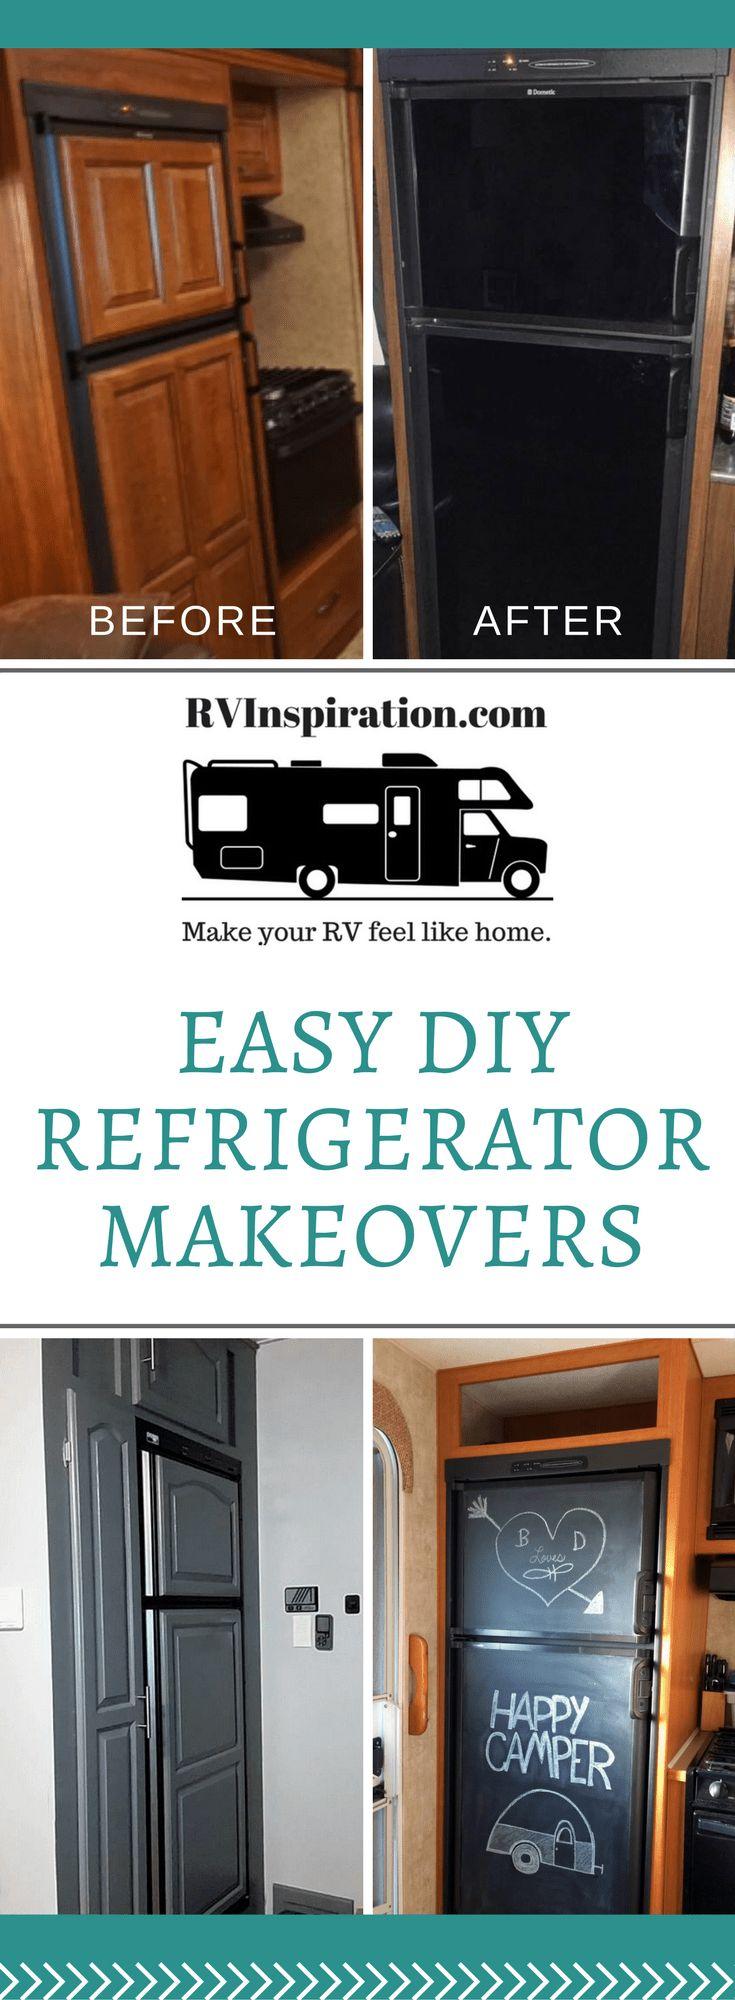 6 RV Refrigerator Makeover Ideas